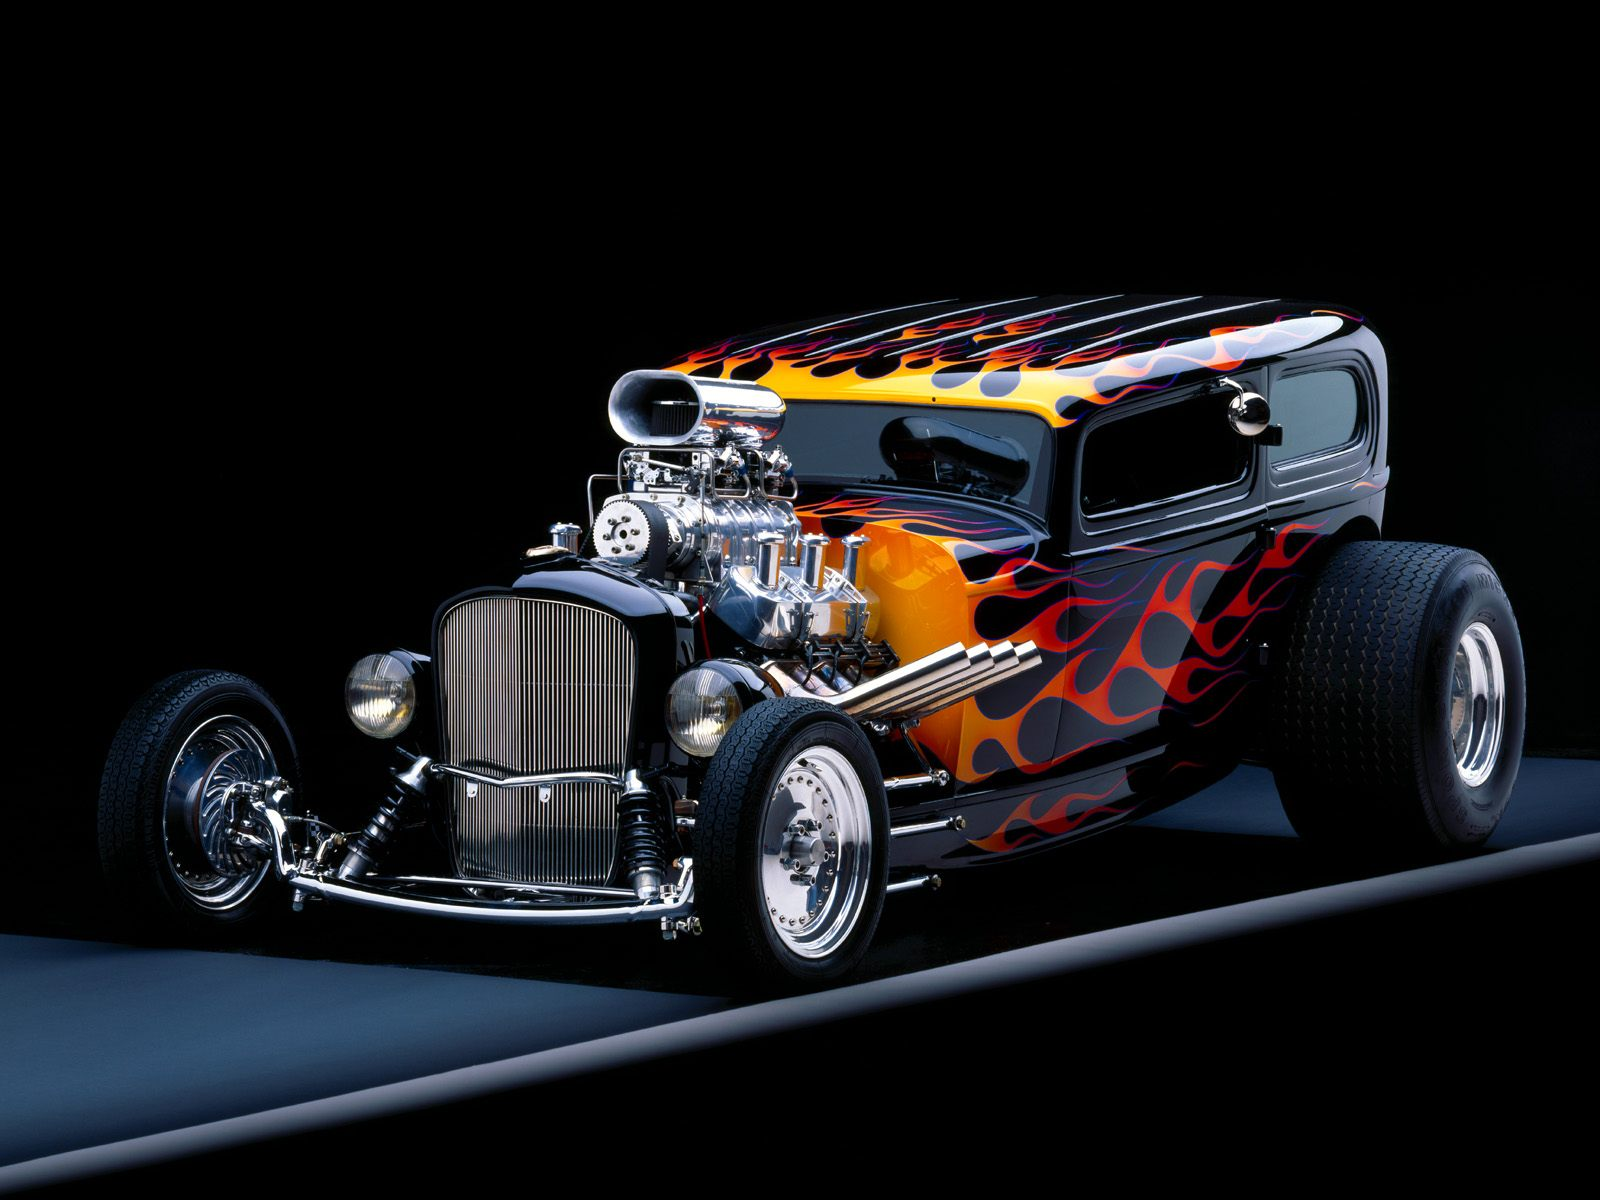 Desktop wallpaper downloads 1932 Ford Tudor car high resolution 1600x1200